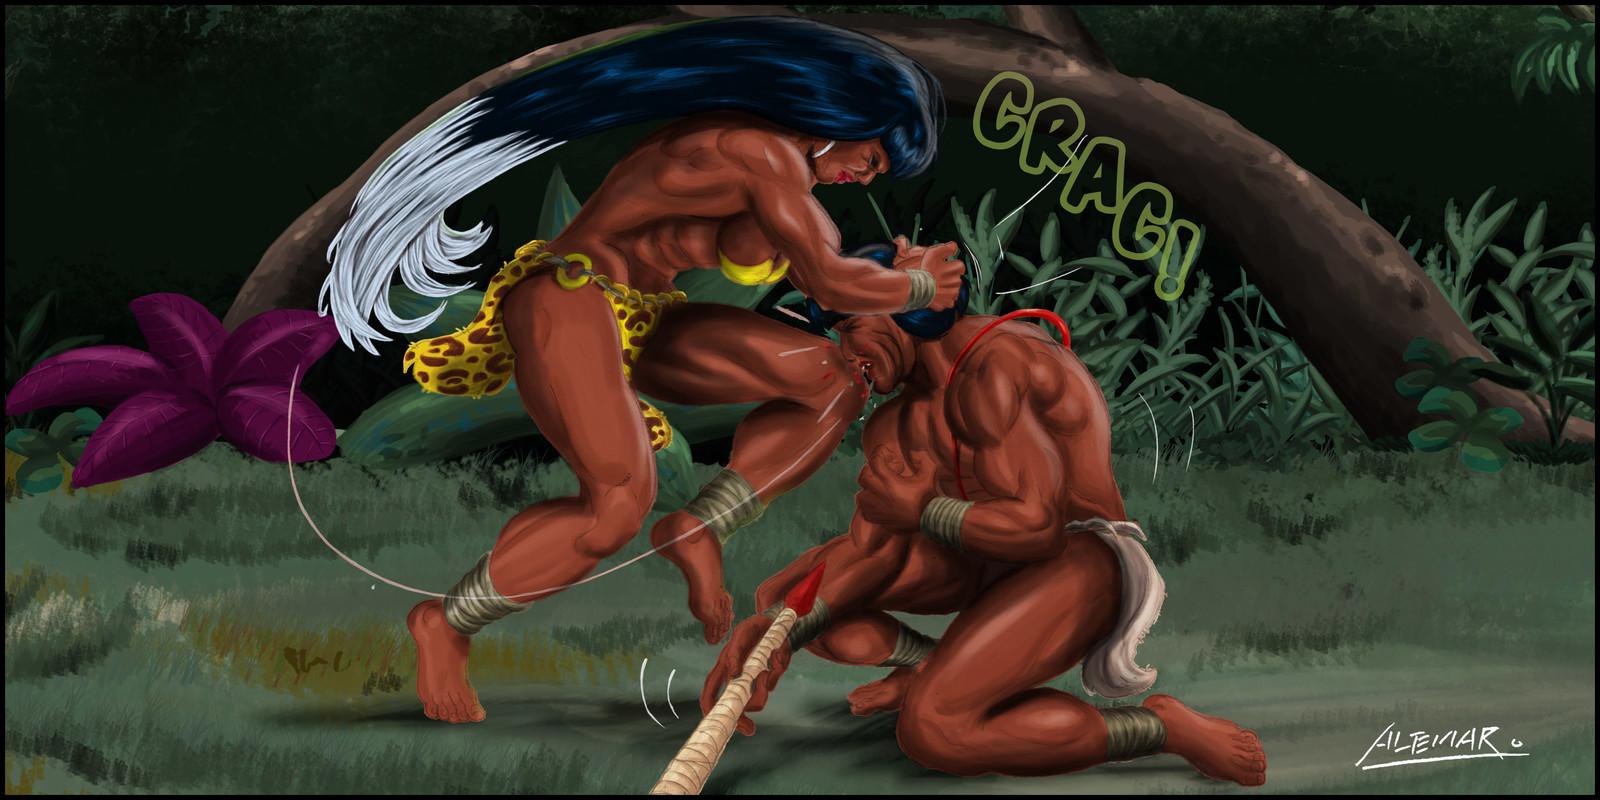 Jaguara - Strikes the enemy